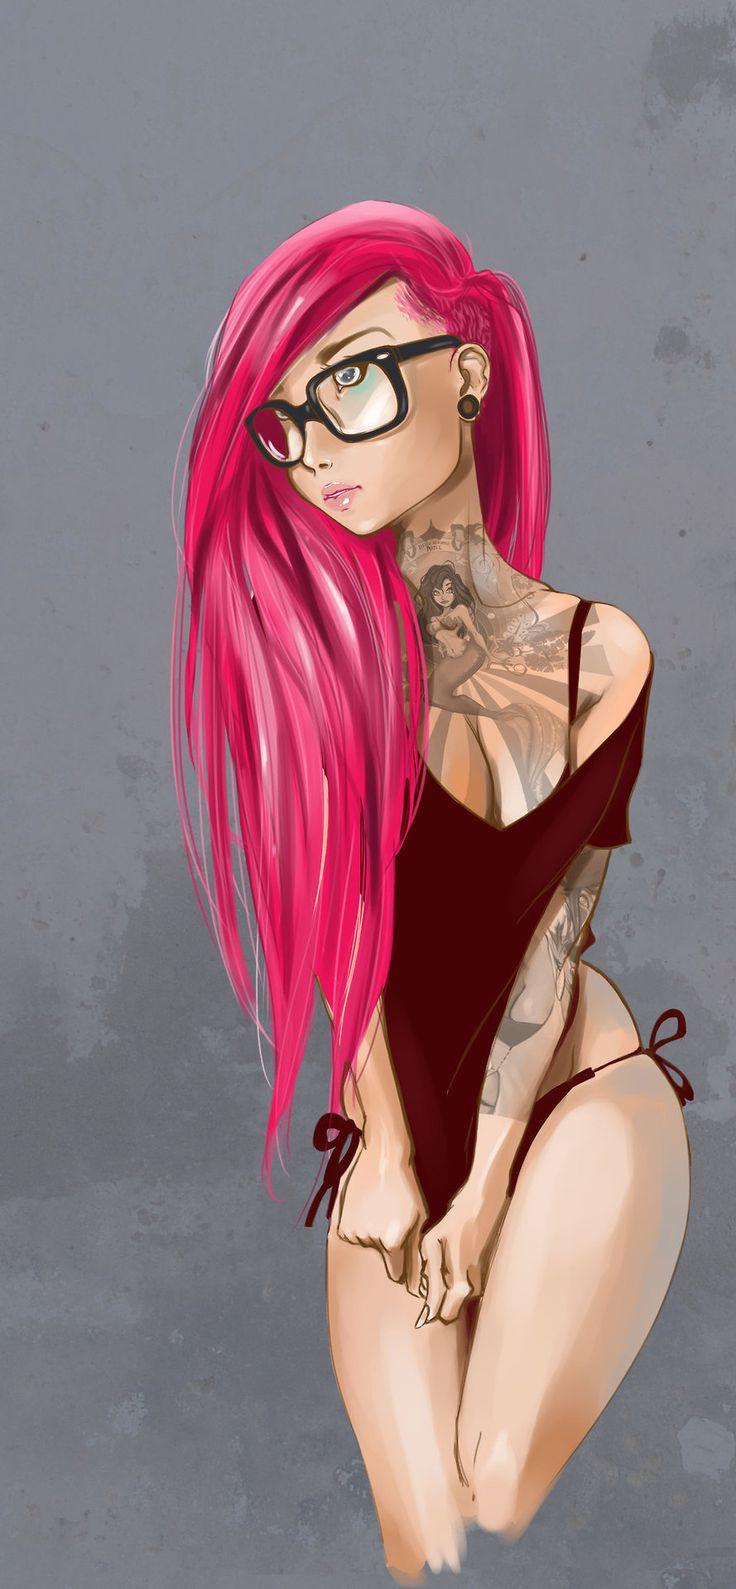 Nude chennai adult girls pics